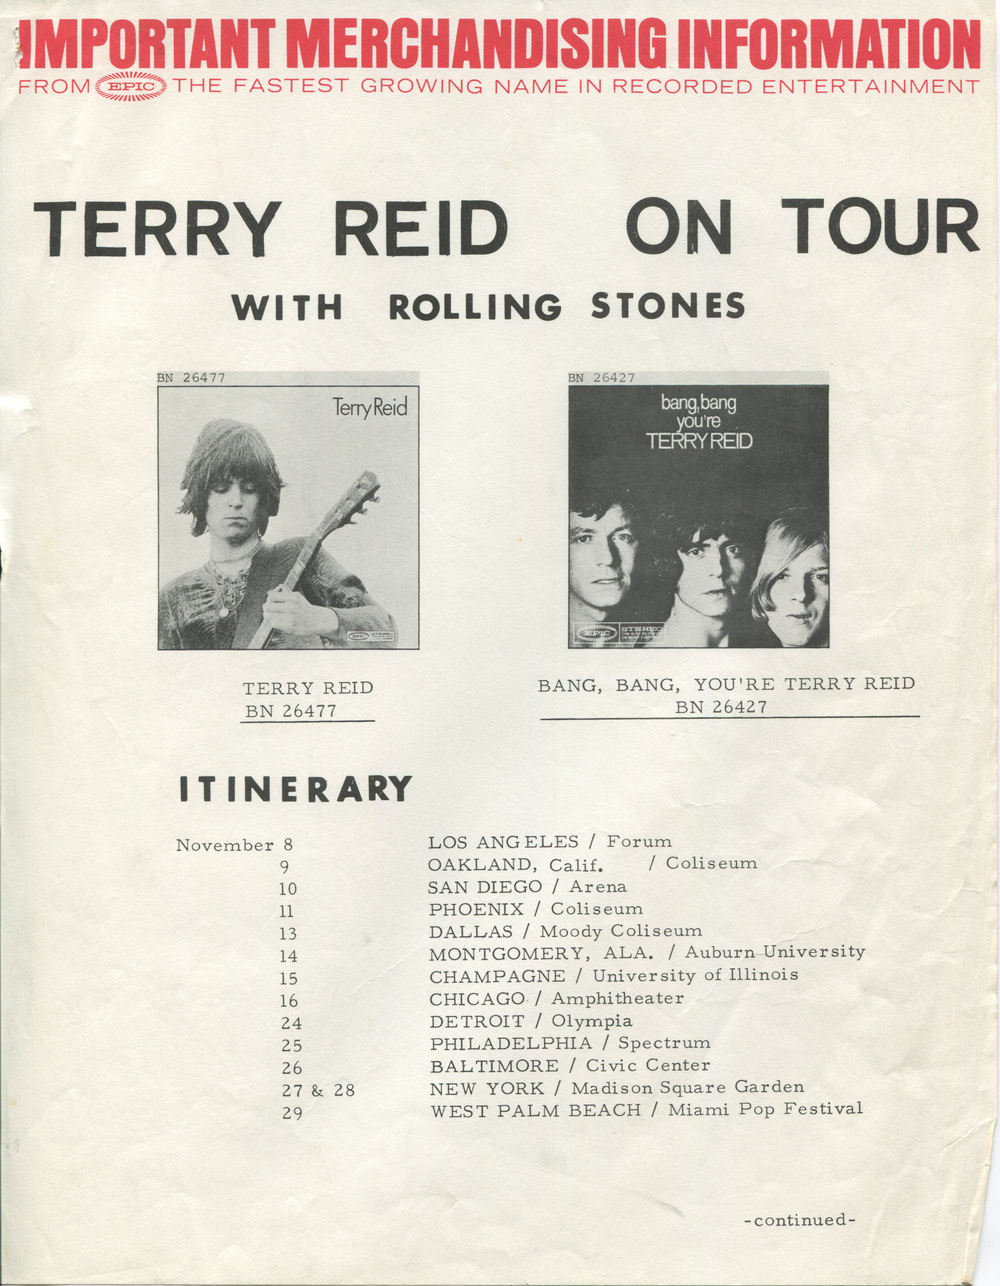 Rolling-Stones-Tour-Merch-Memo-2.jpg